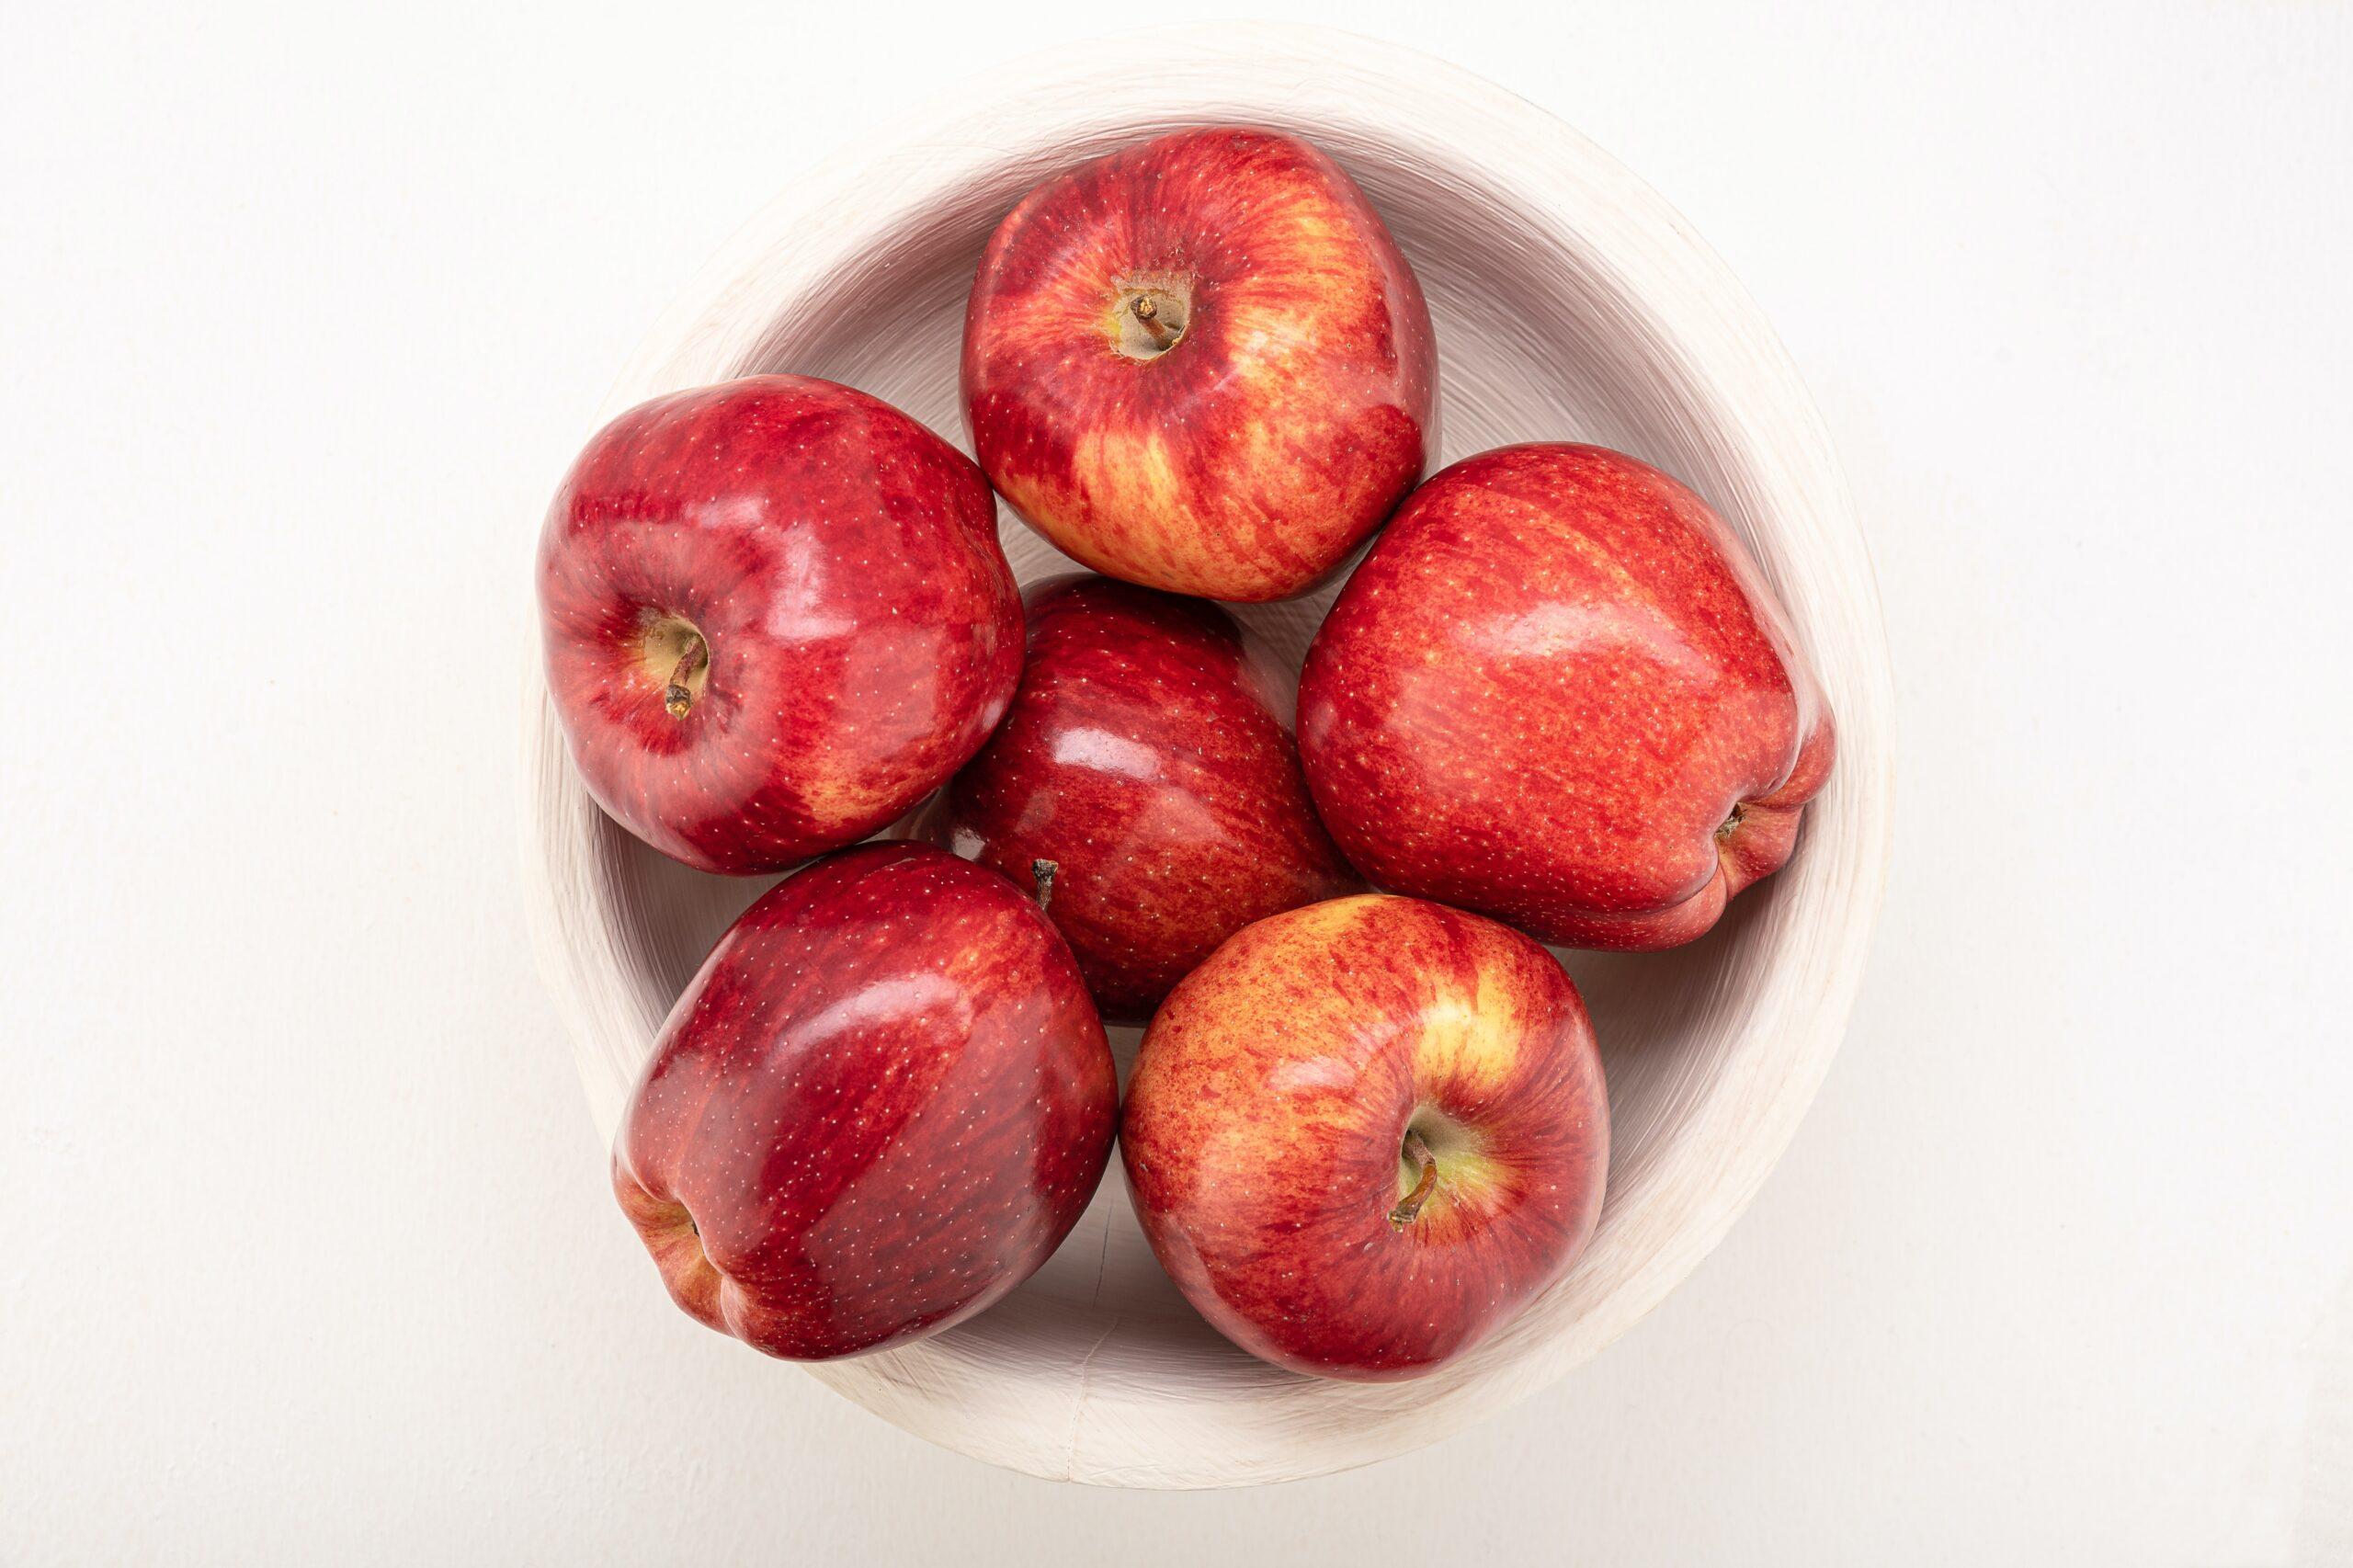 alma, apple